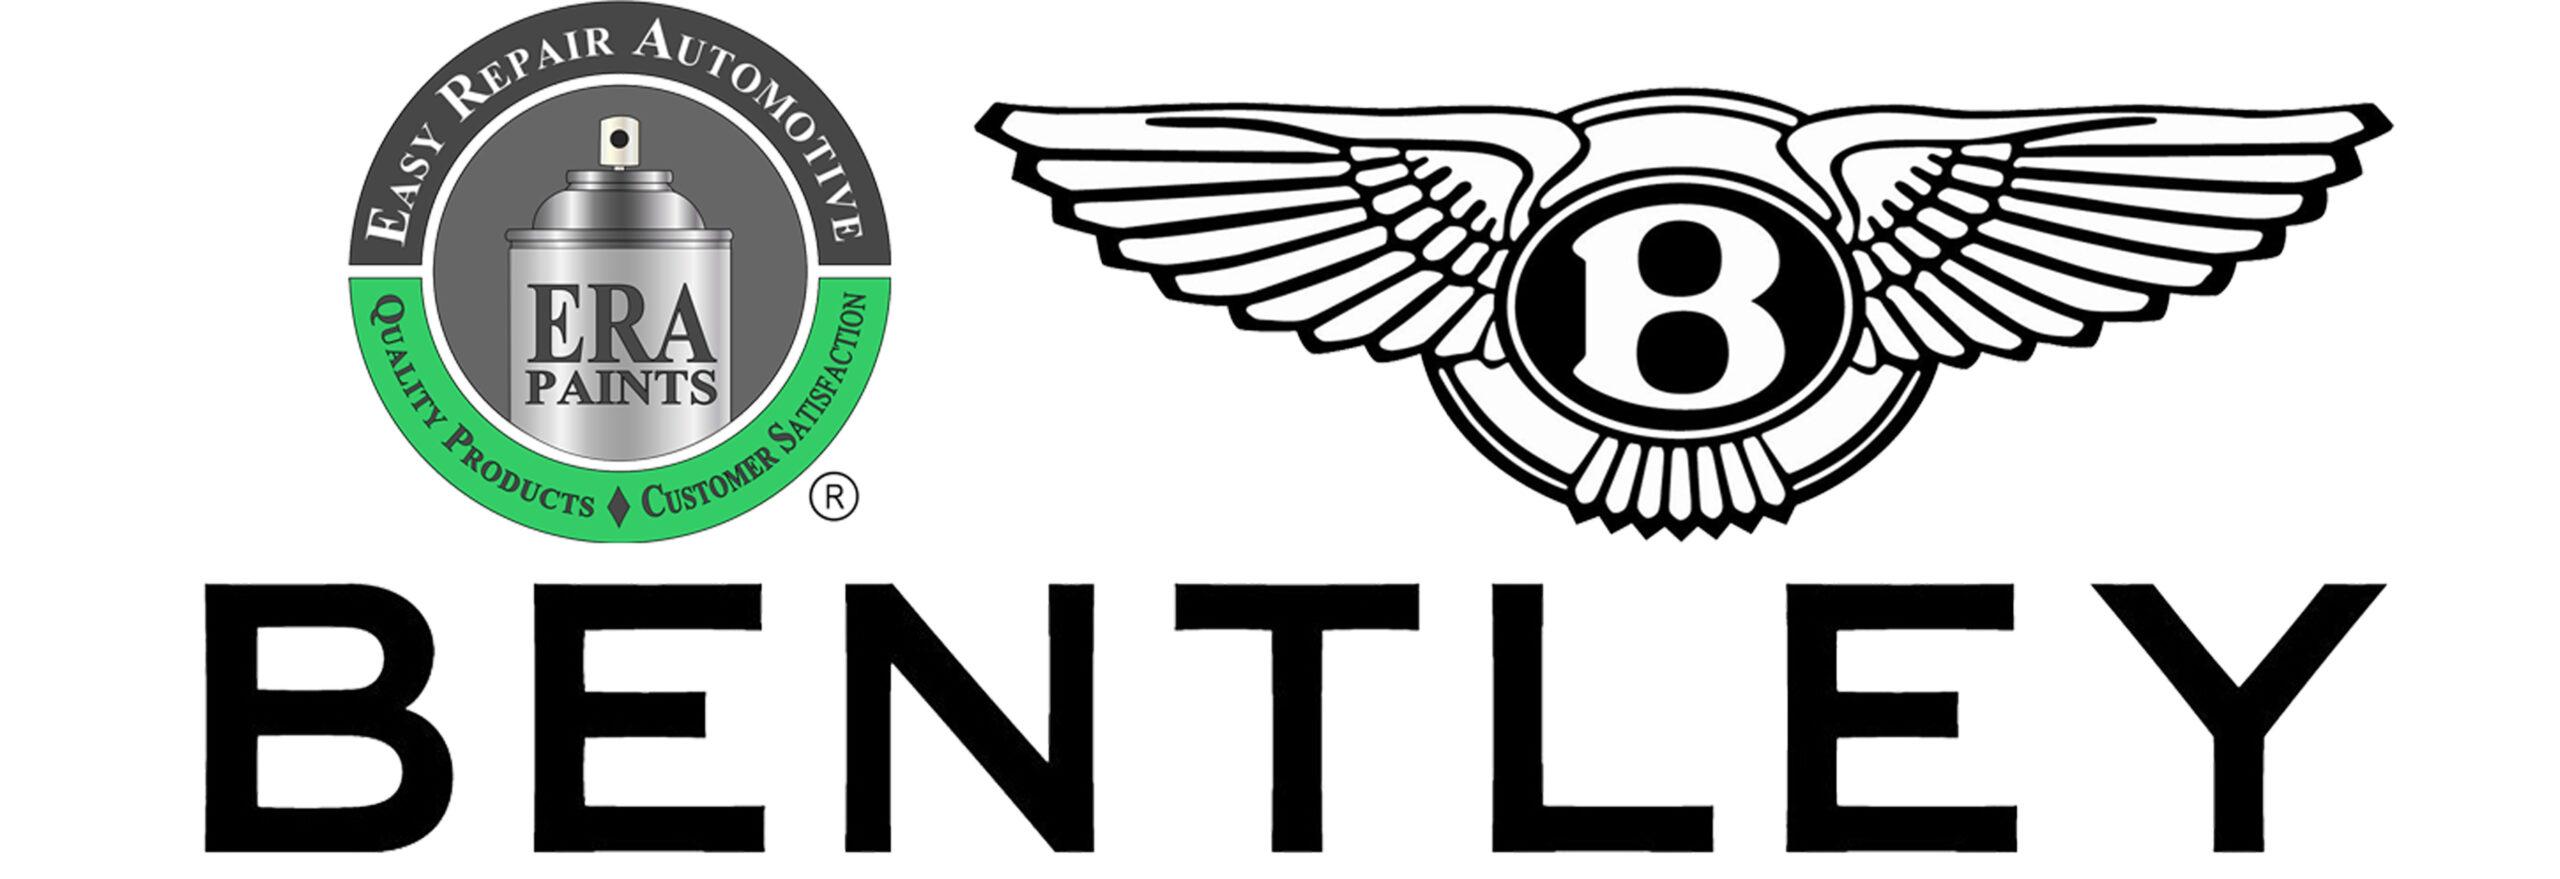 ERA Paints and Bentley Logo